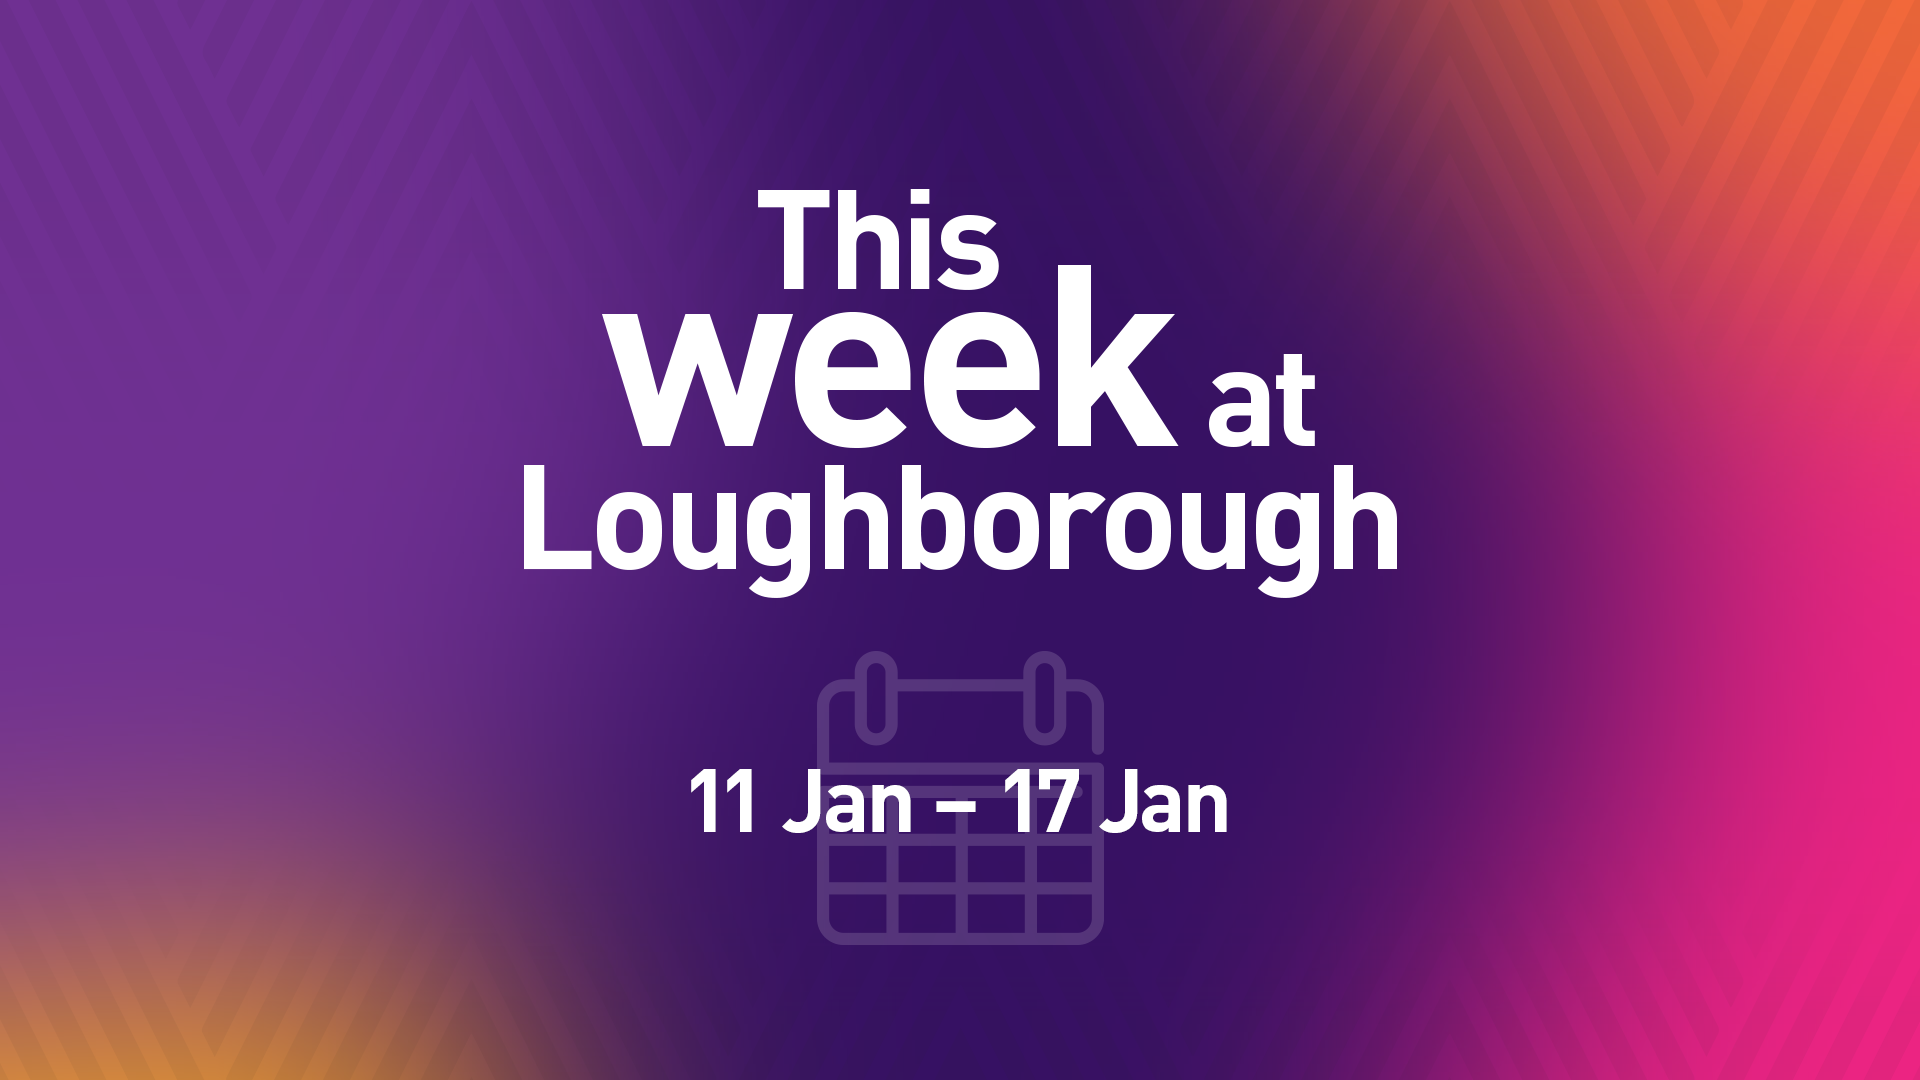 This Week at Loughborough | 11 January